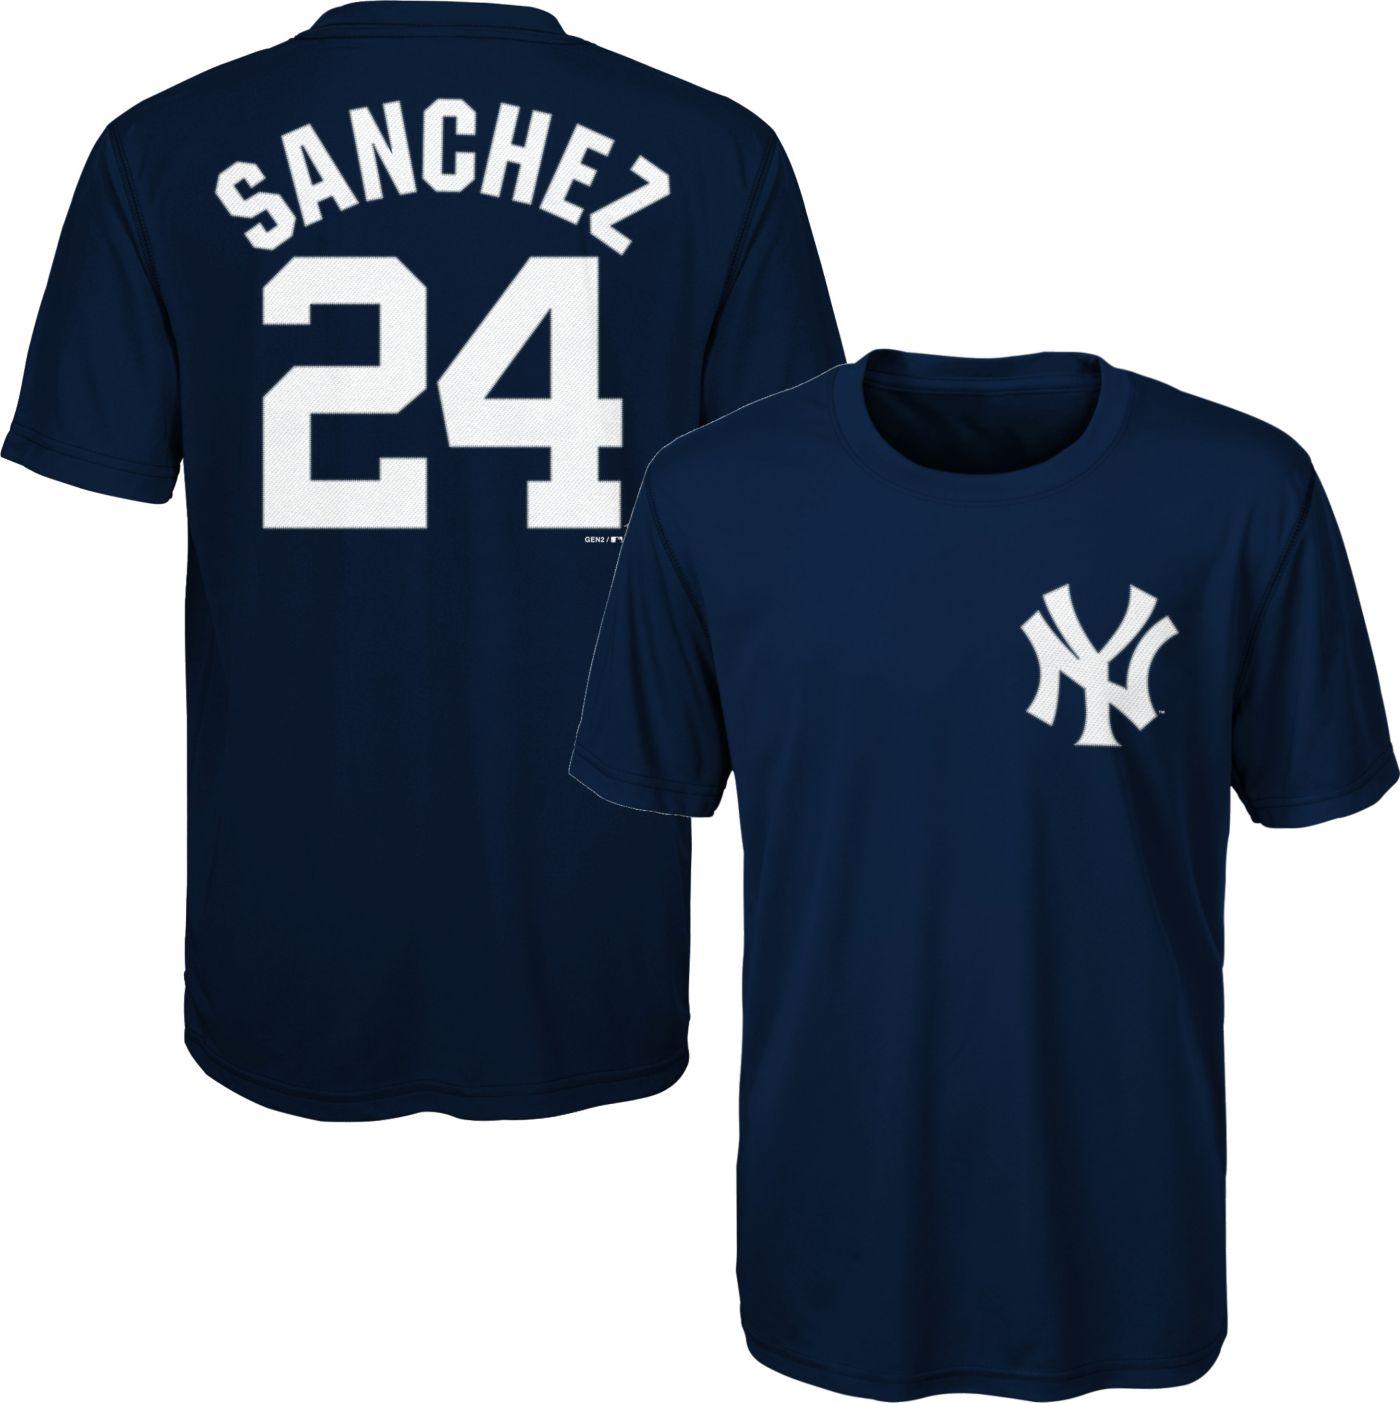 Majestic Youth New York Yankees Gary Sanchez #24 Performance T-Shirt